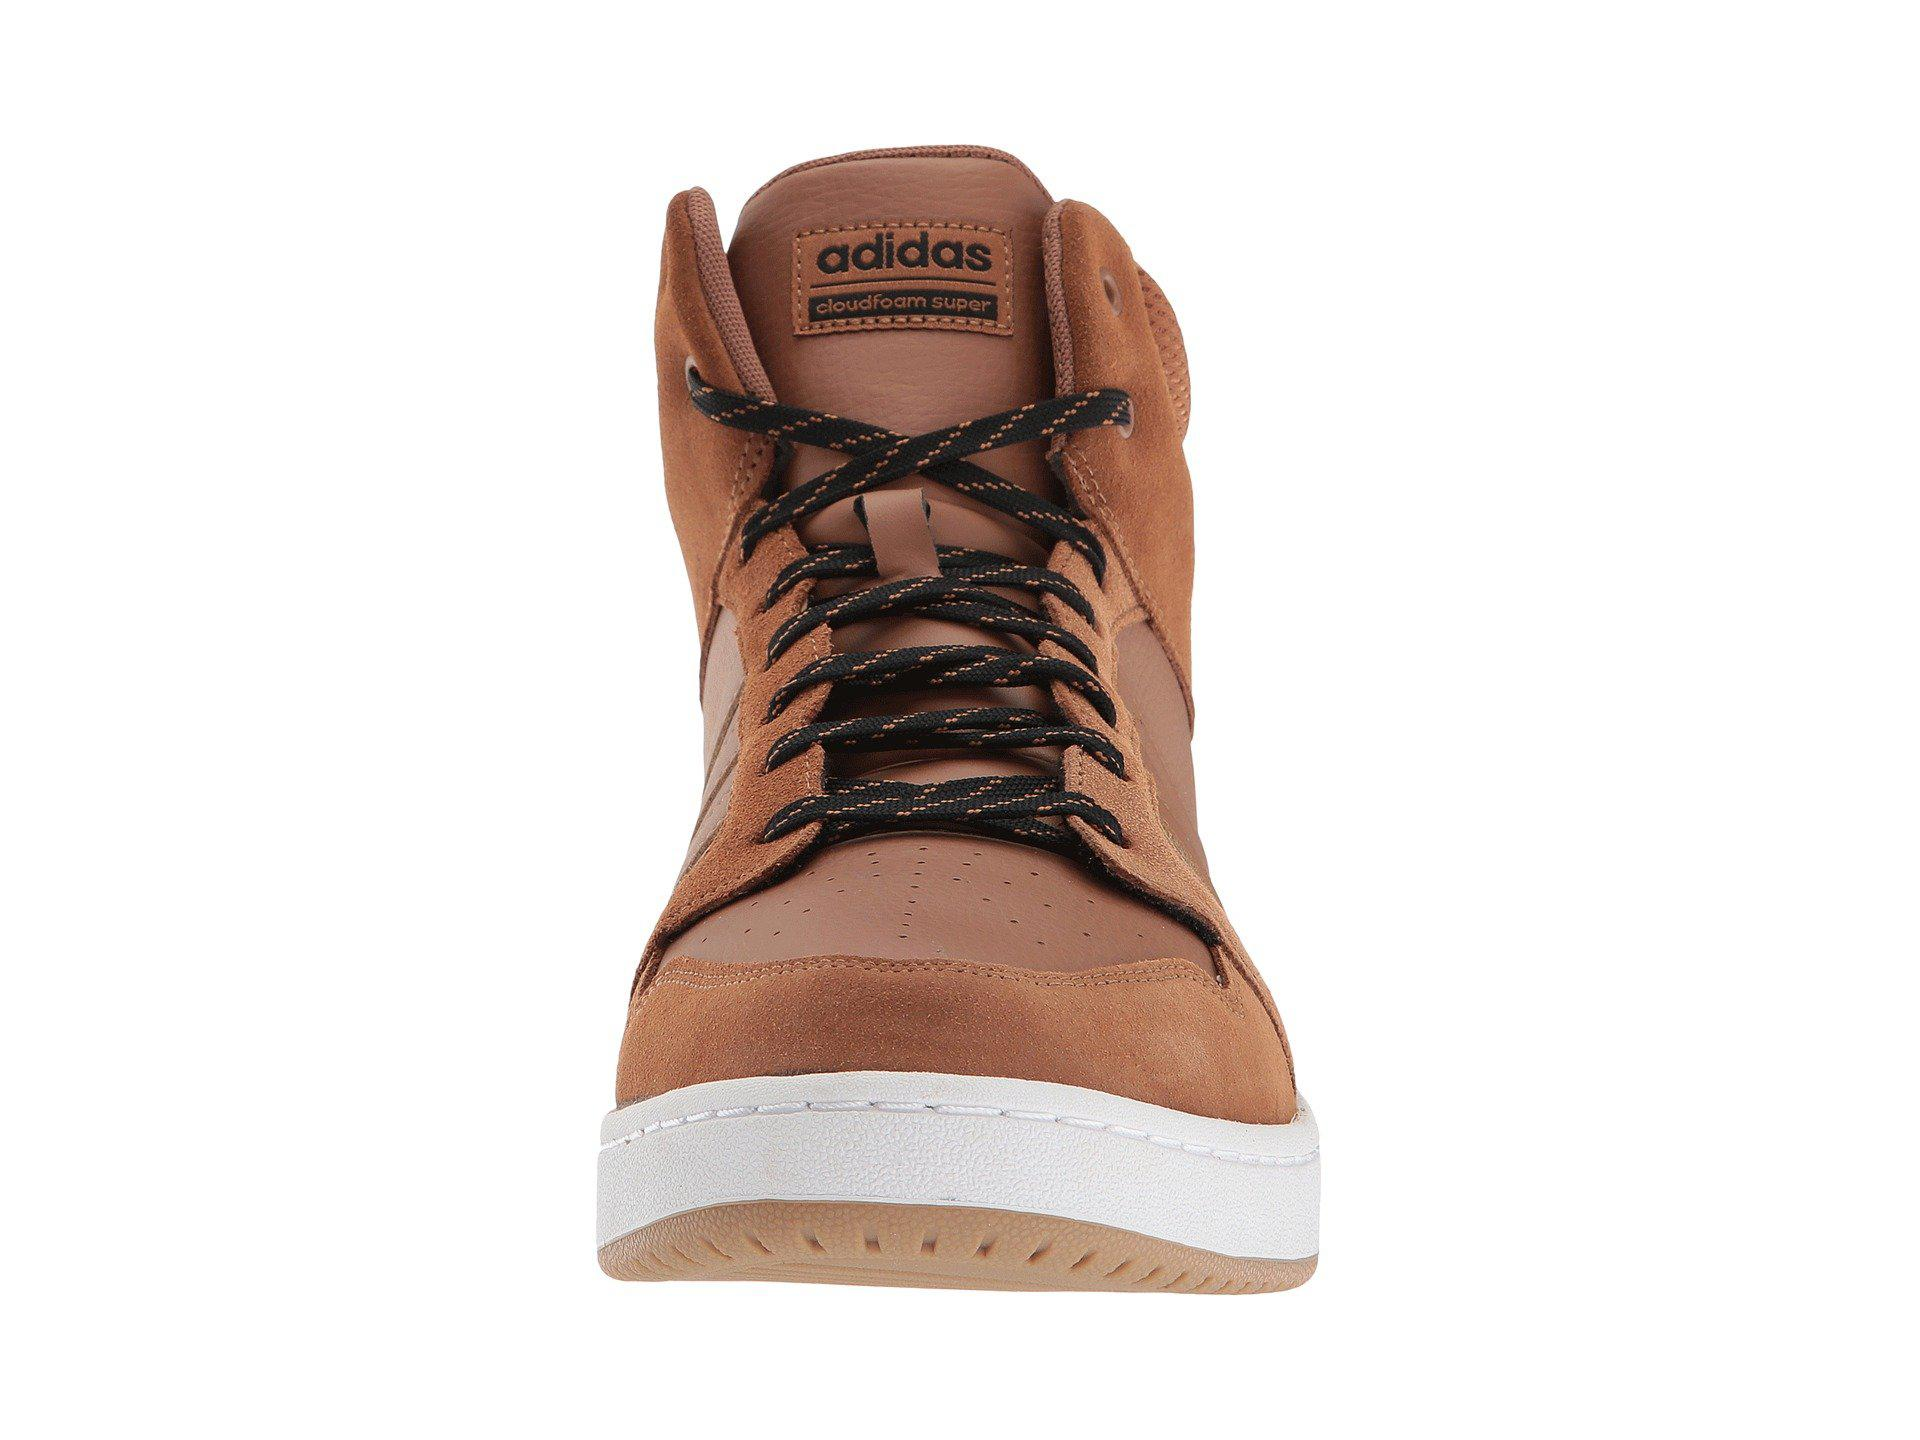 lyst adidas cloudfoam super hoops metà basket scarpa in marrone per gli uomini.